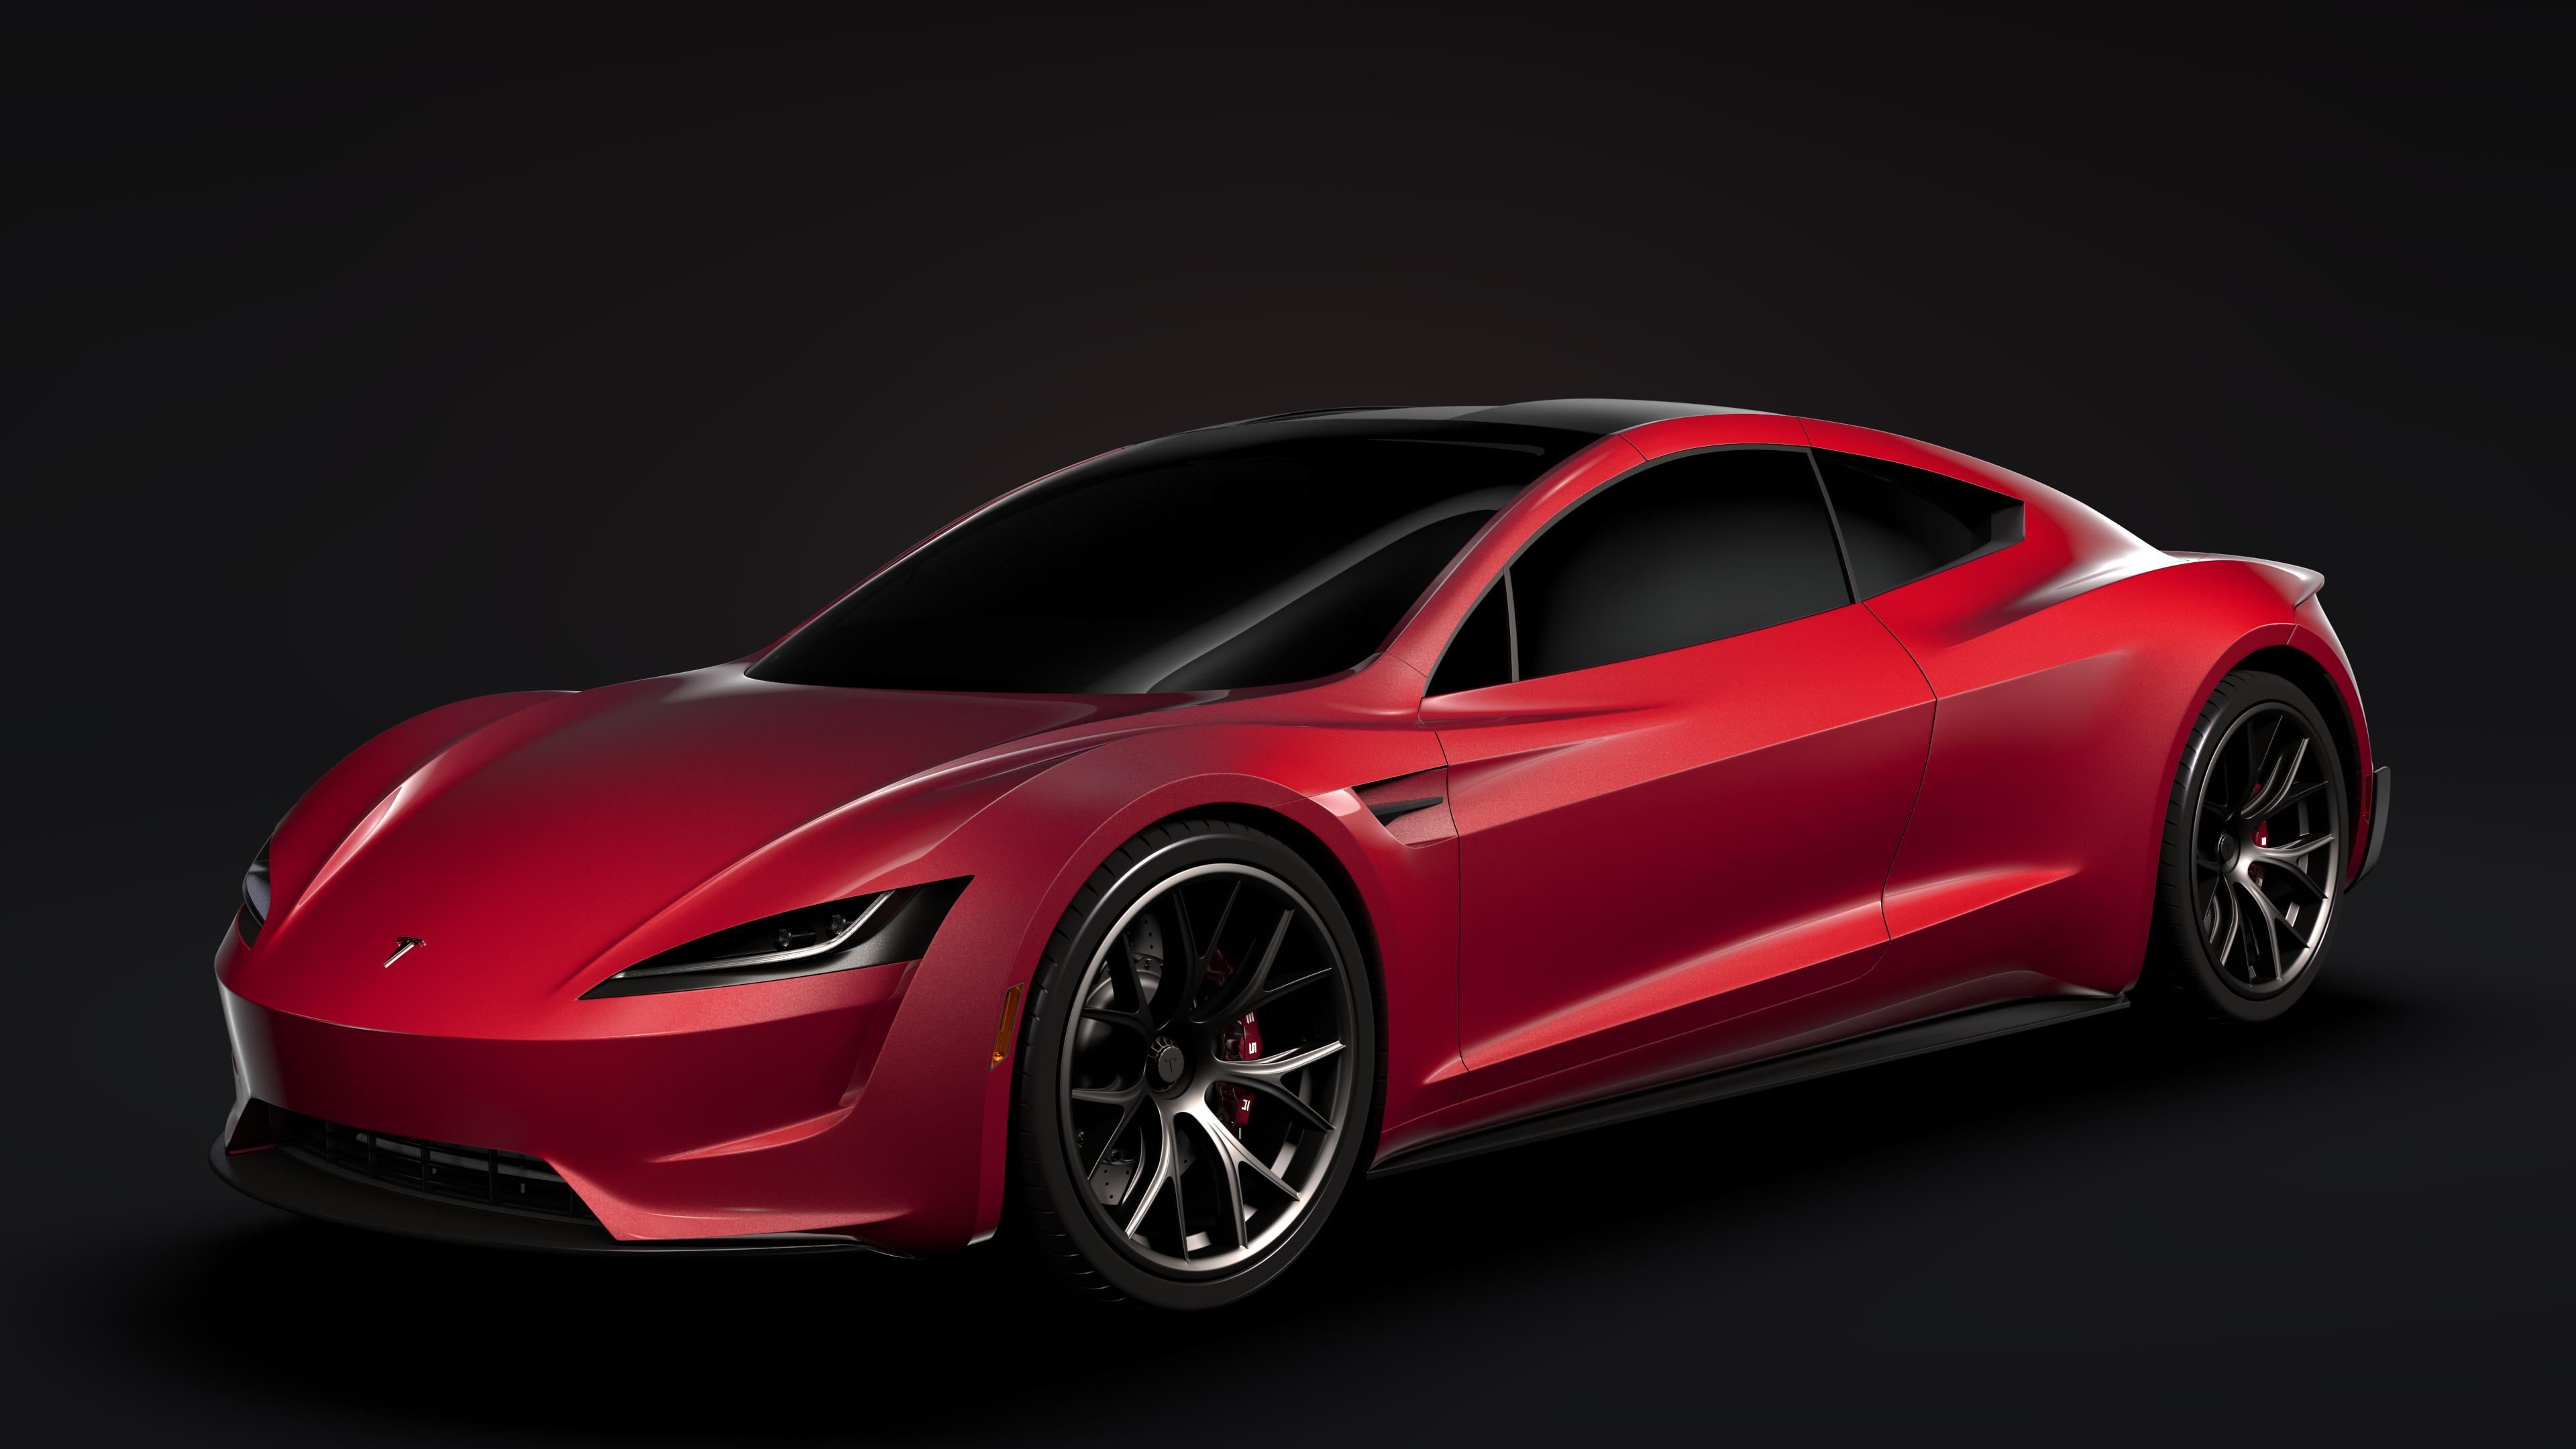 tesla roadster 2020 3d model max fbx c4d lwo ma mb hrc xsi obj 278012